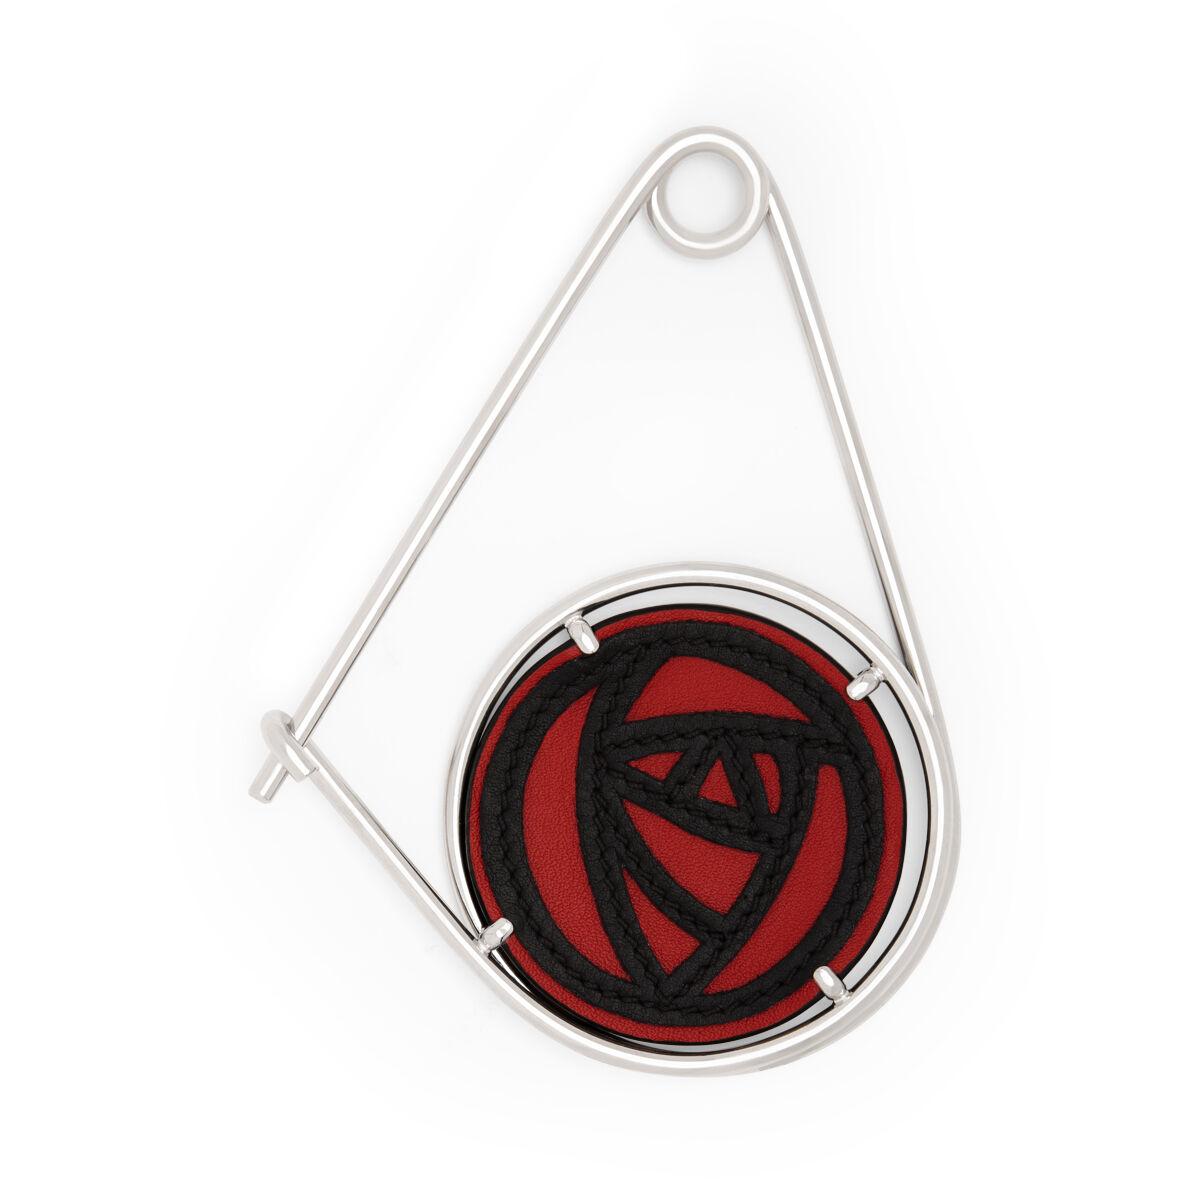 LOEWE Pin Meccano Roses Rojo Escarlata/Negro front